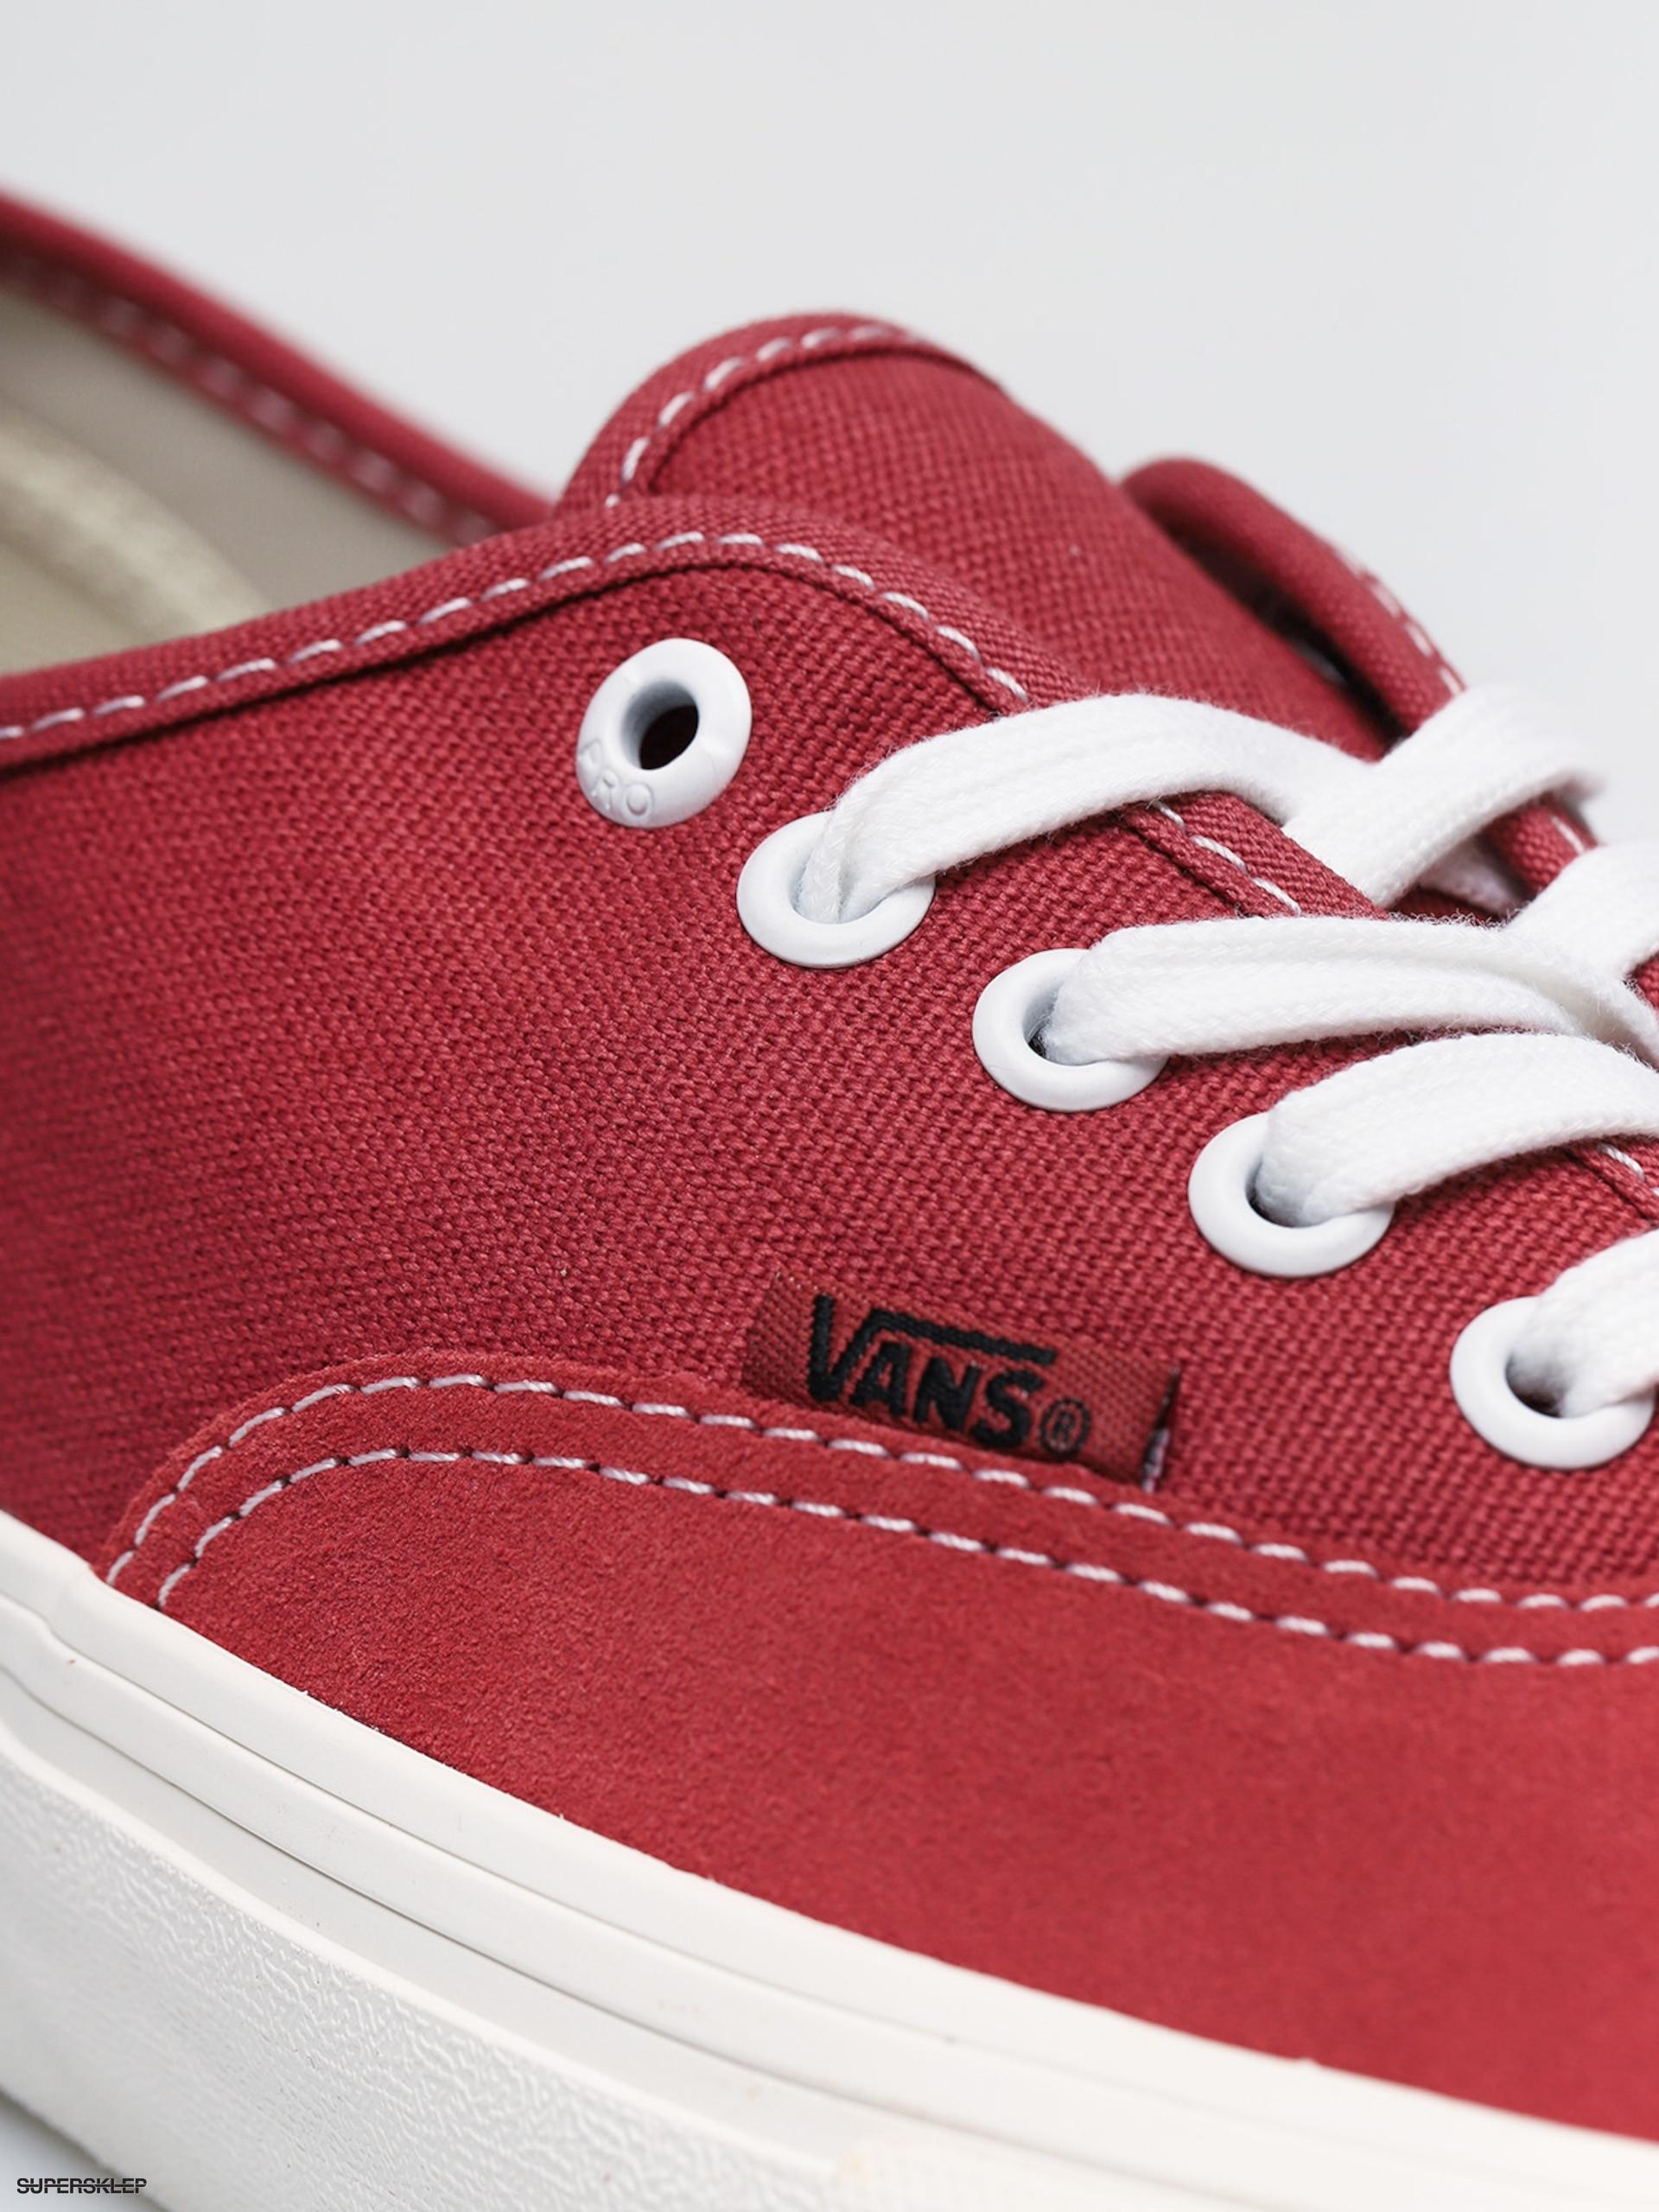 Vans Buty męskie Authentic czerwone r. 44 (VN0A38EMVK51) ID produktu: 5918508